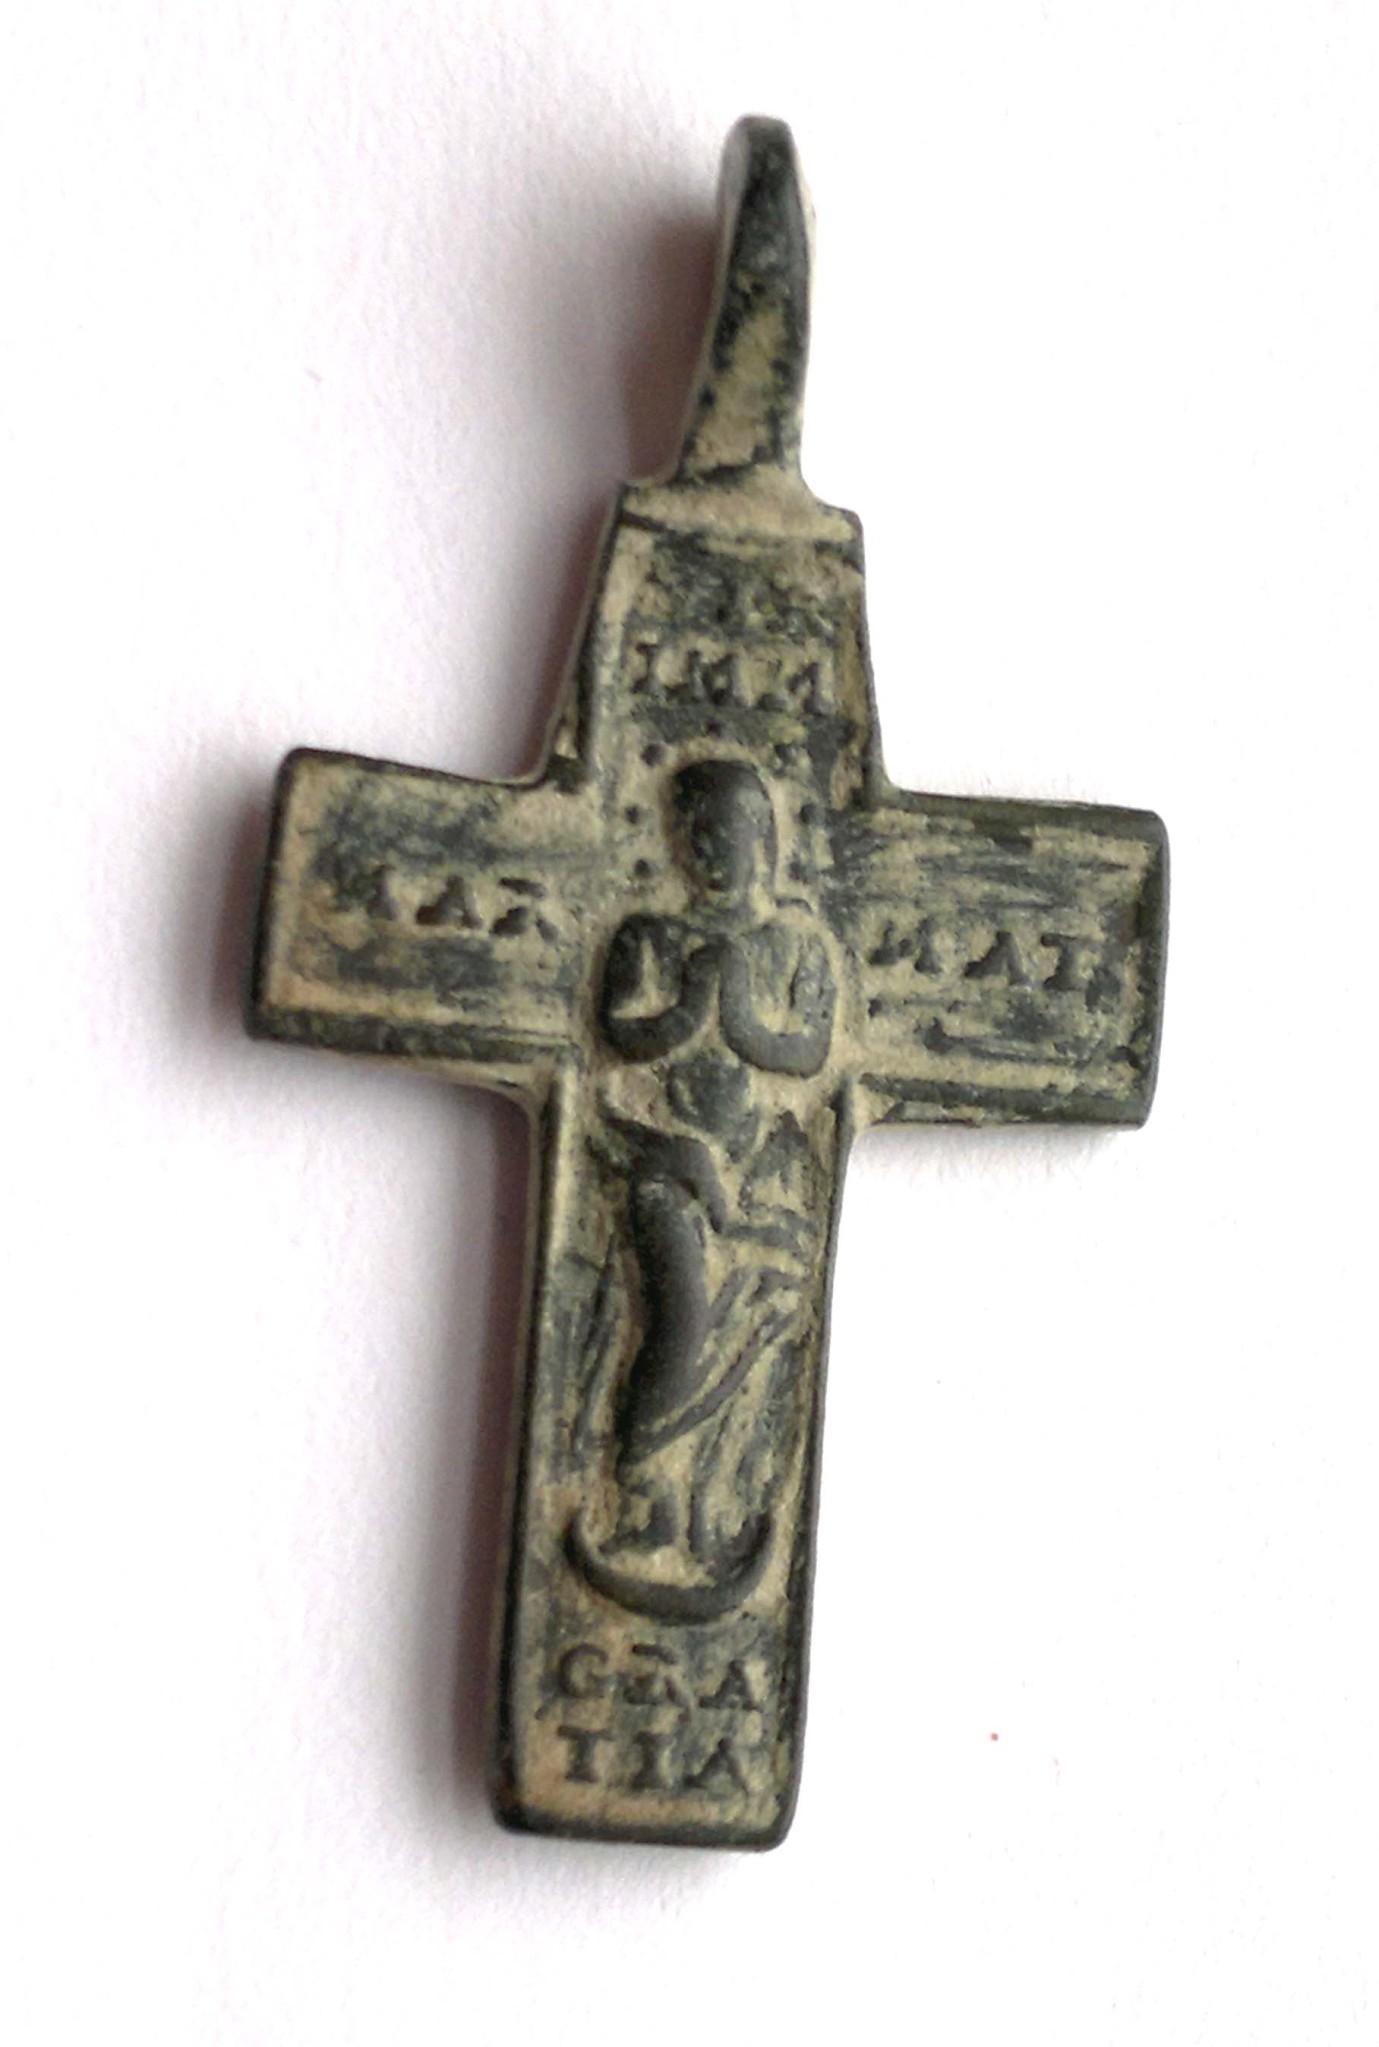 Cruz bifaz en bronce S-XVIII Rev : VIRGO IMMACULATA MARIA MATER GRATIAE 25isp50